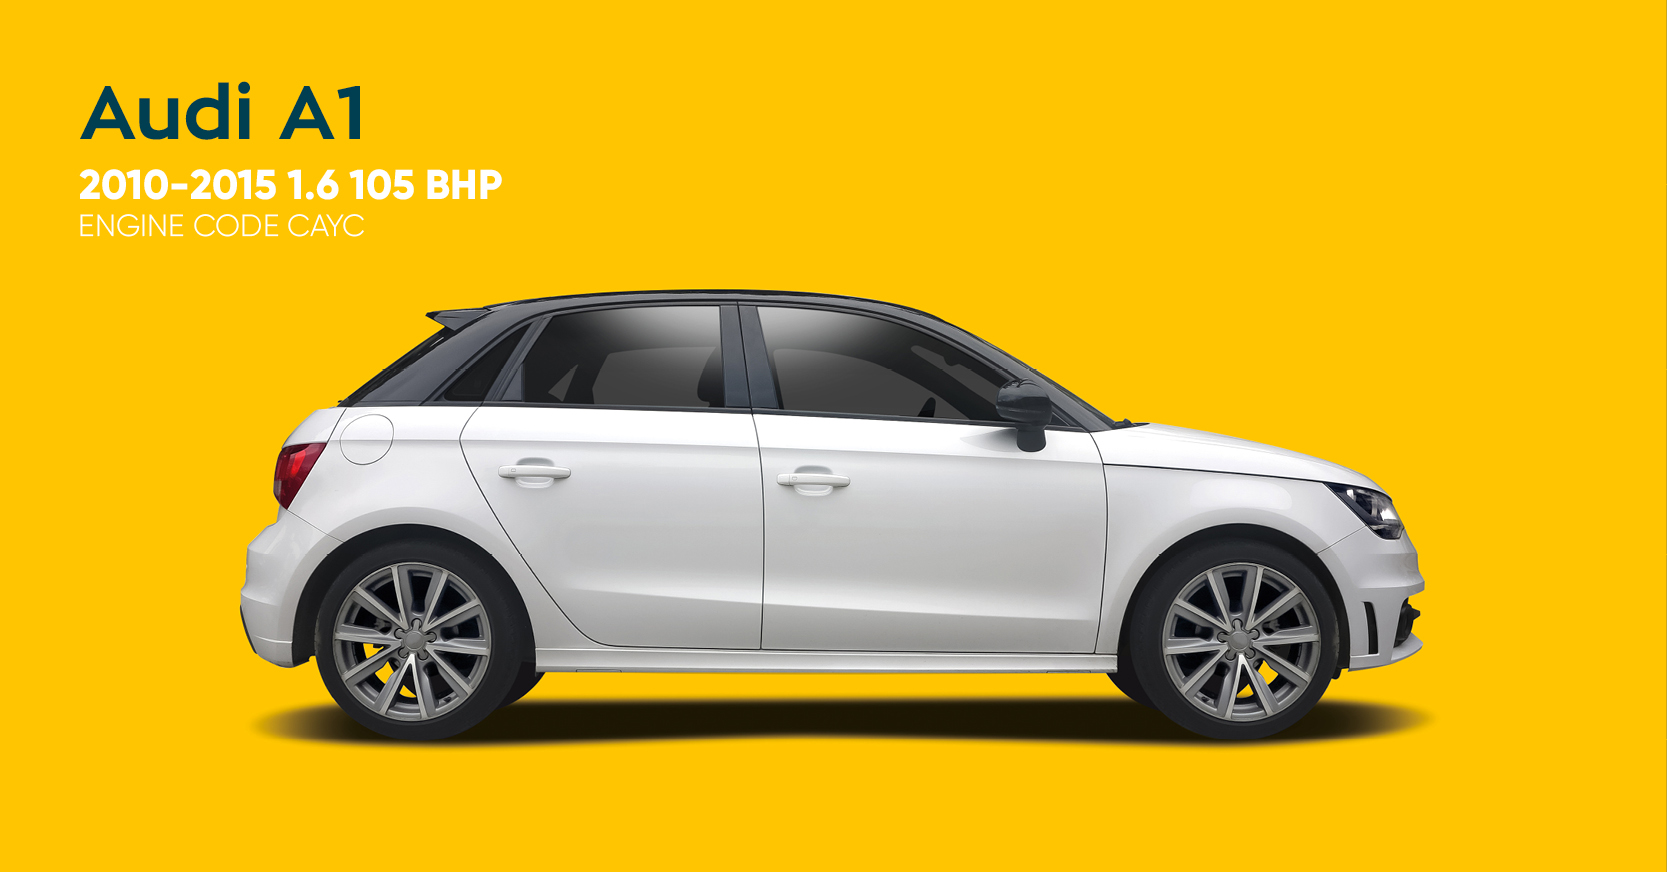 Audi A1 2010-2015 1.6 105BHP